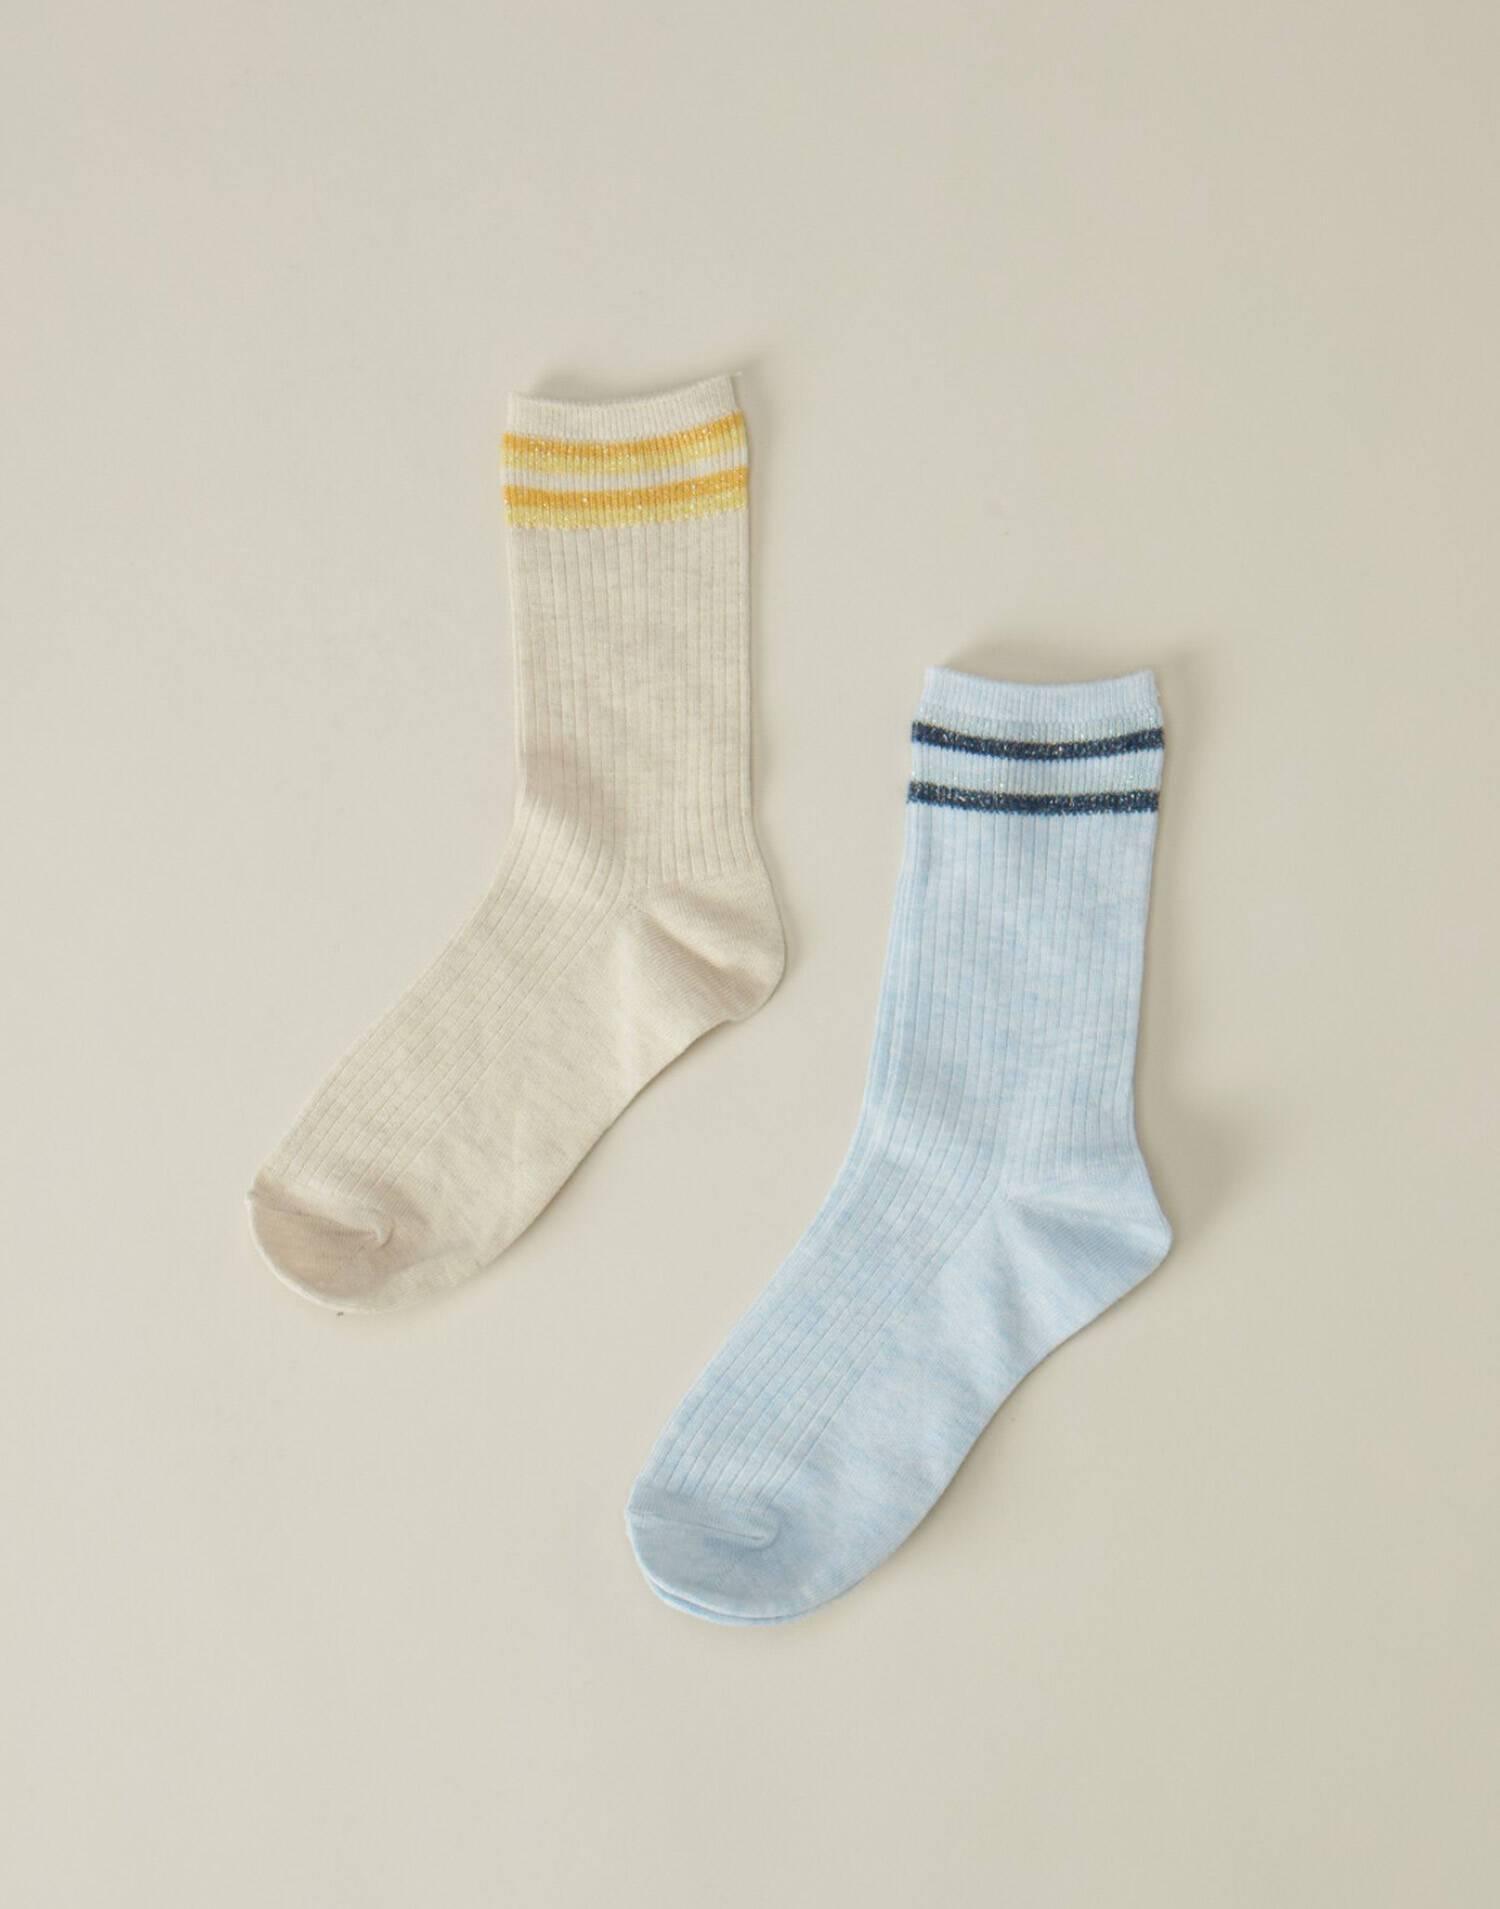 Set of 2 ribbed socks